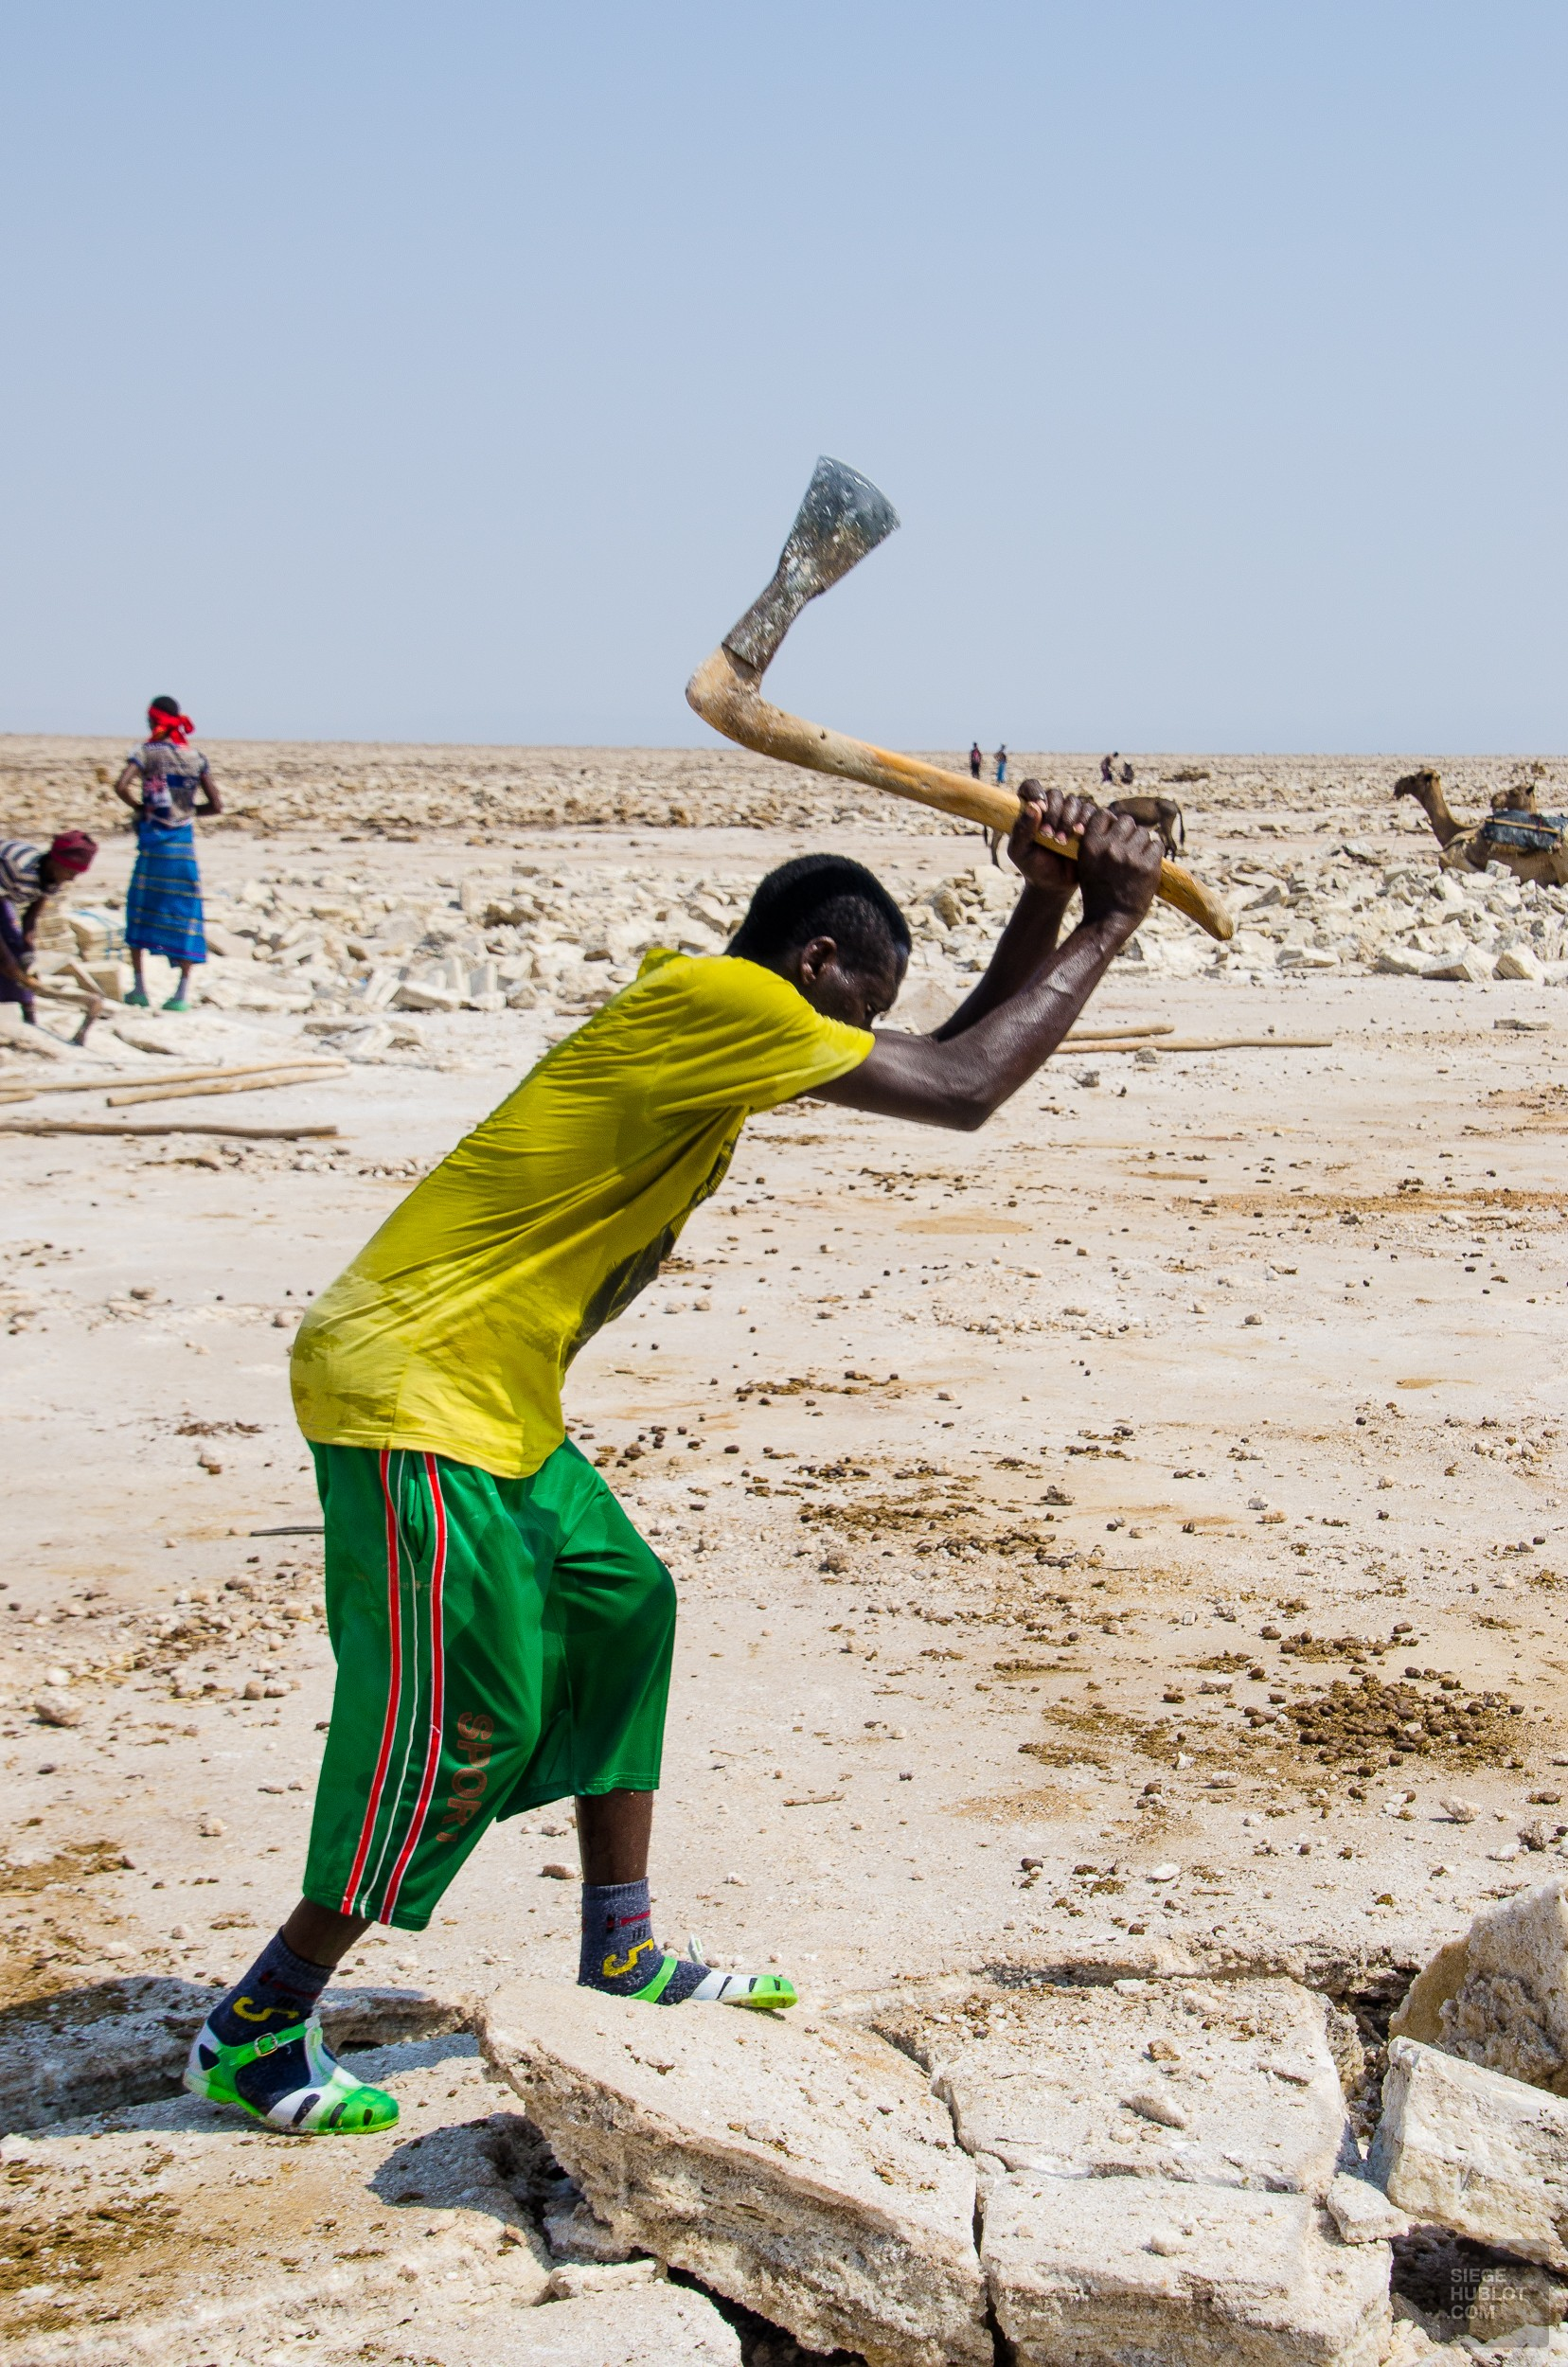 briser sel - Desert de sel - Visiter une autre planete: Danakil, Ethiopie - afrique, ethiopie